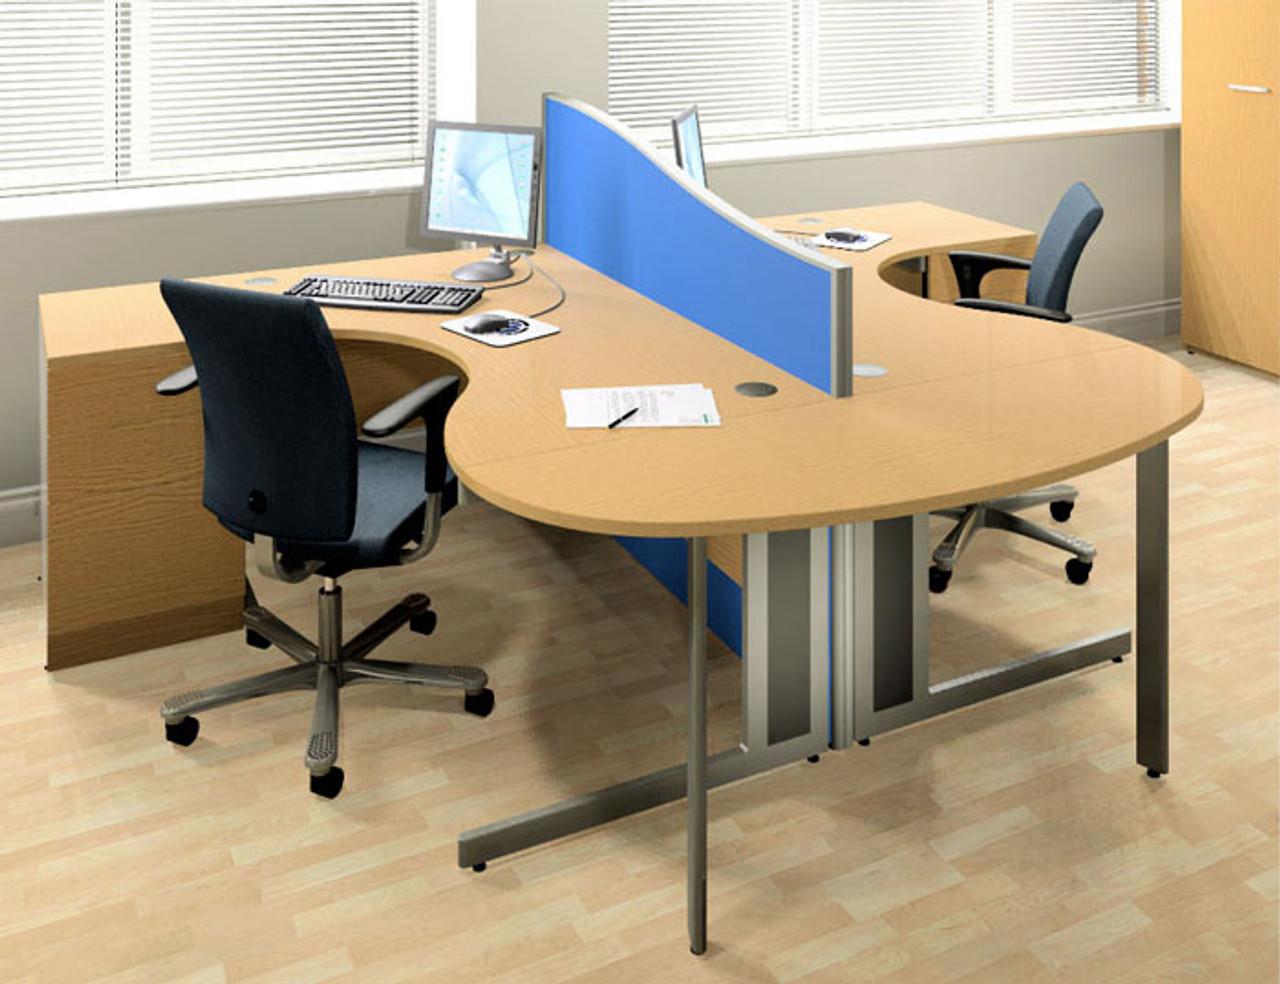 X-Range Compact Corner Desks